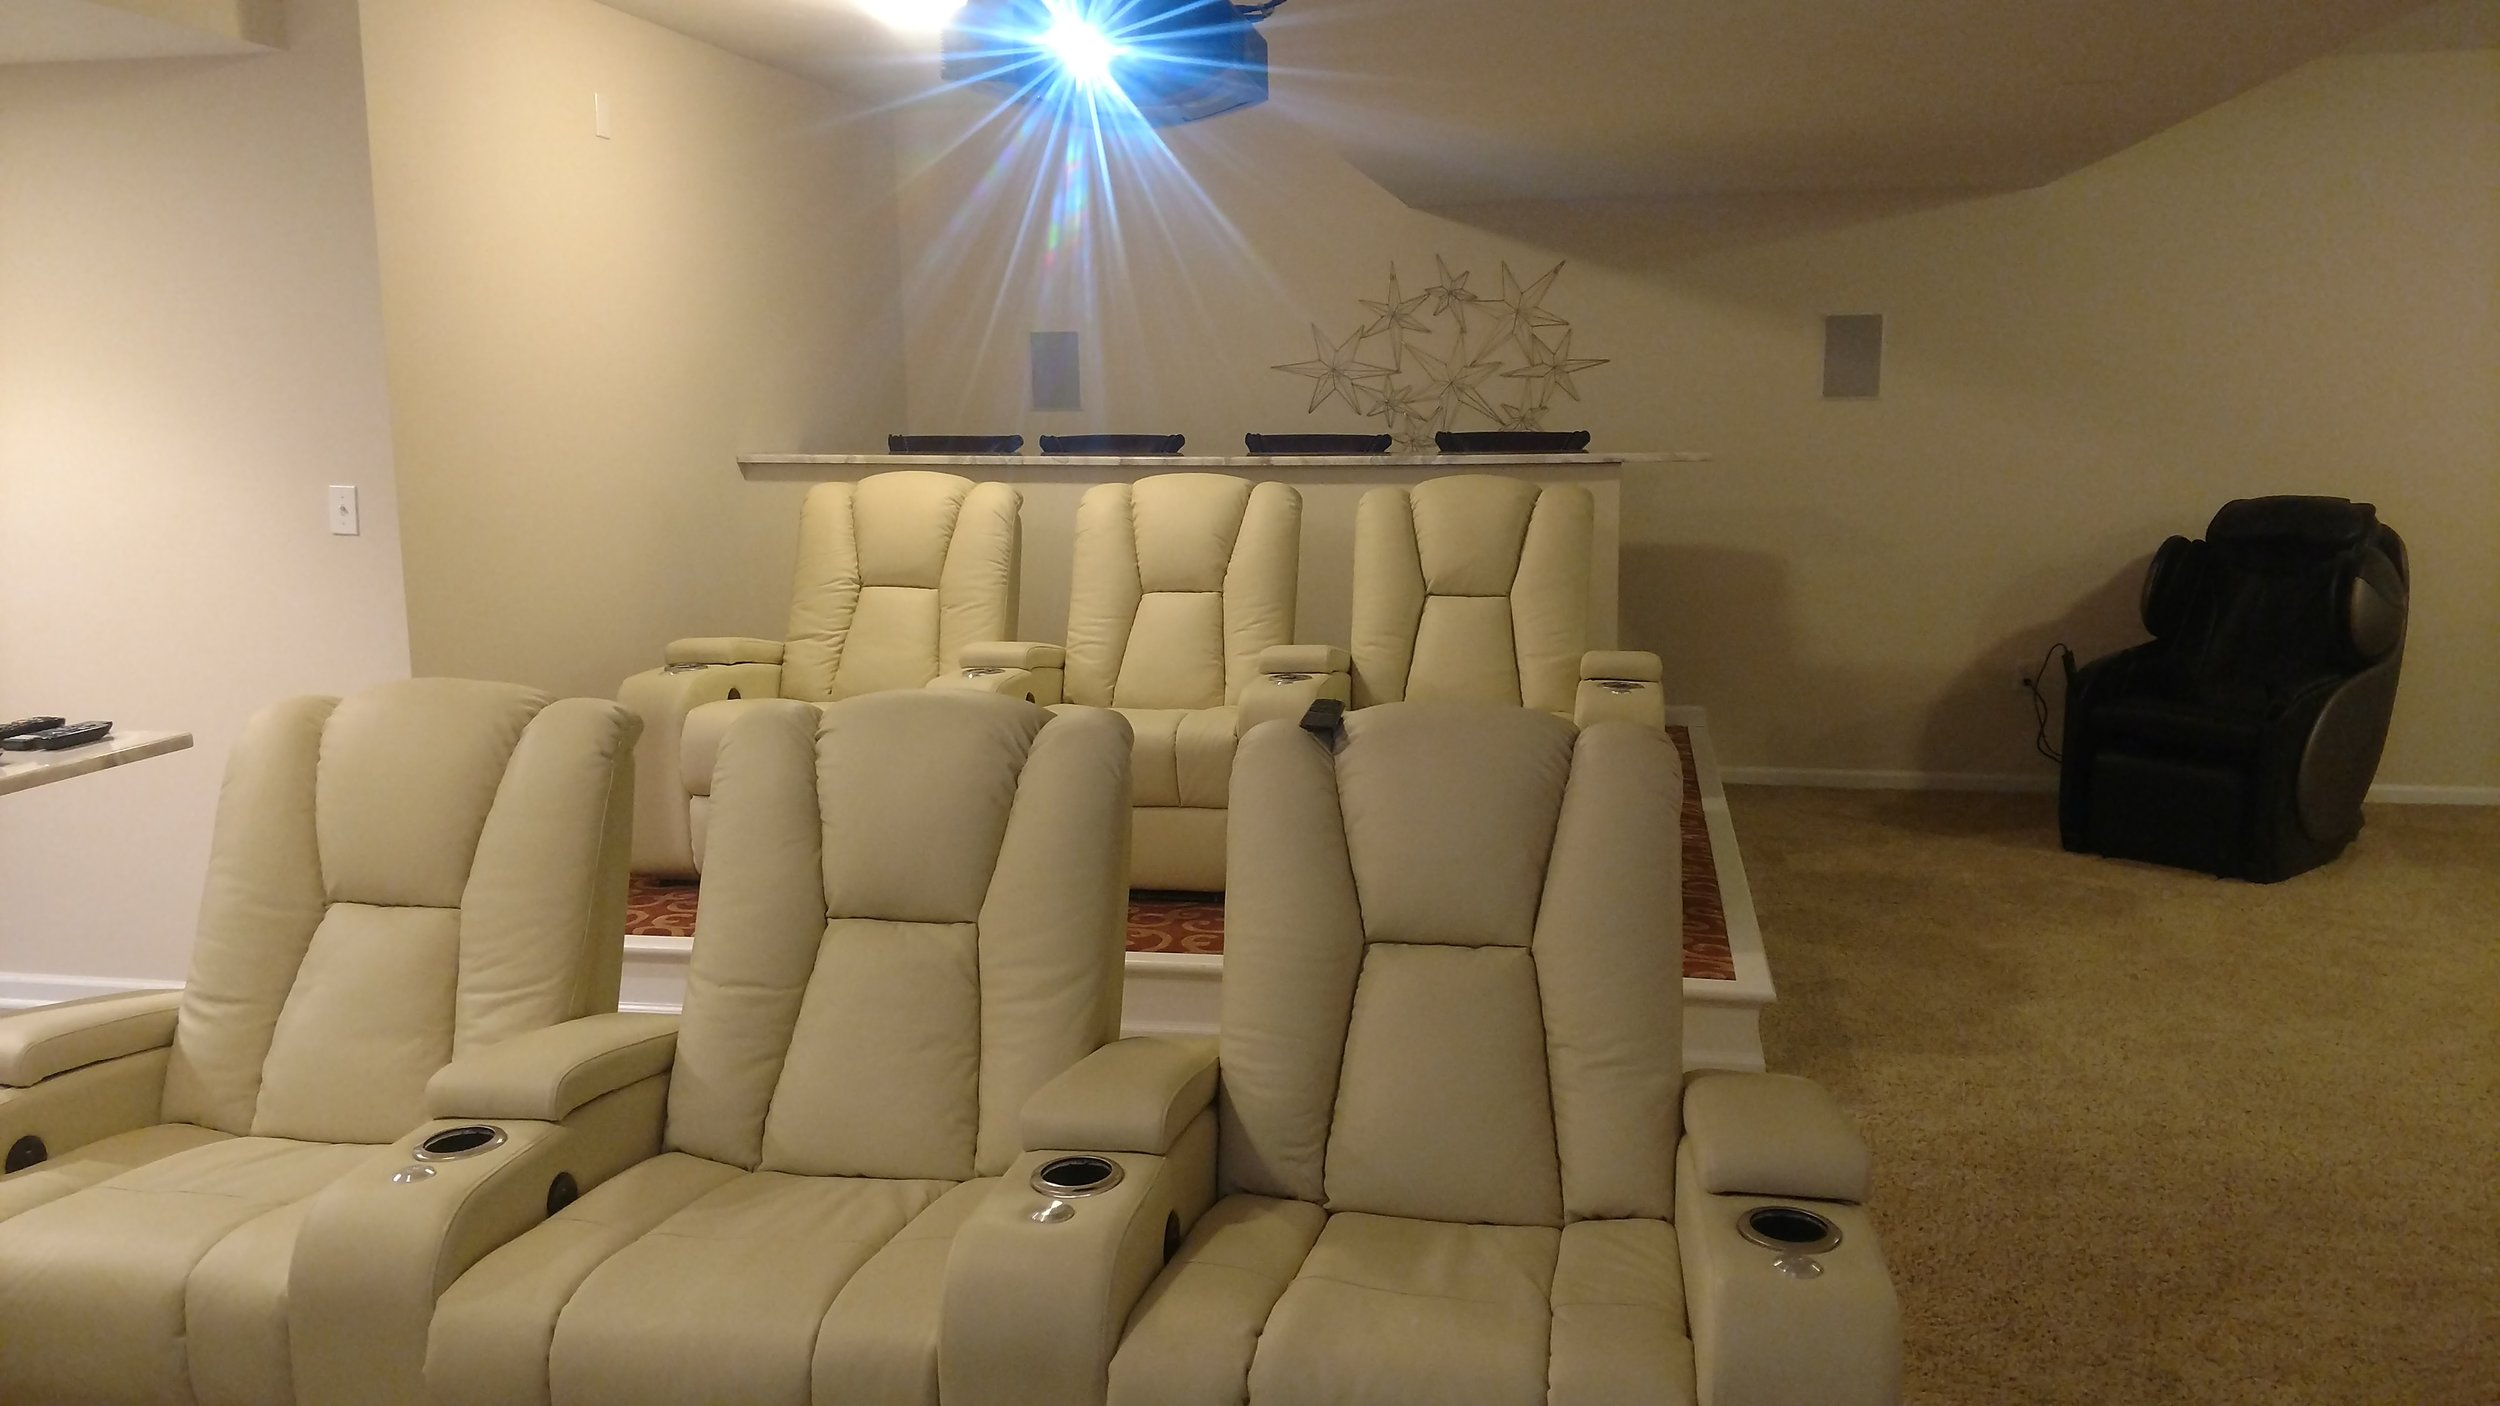 yasdet front seats.jpg